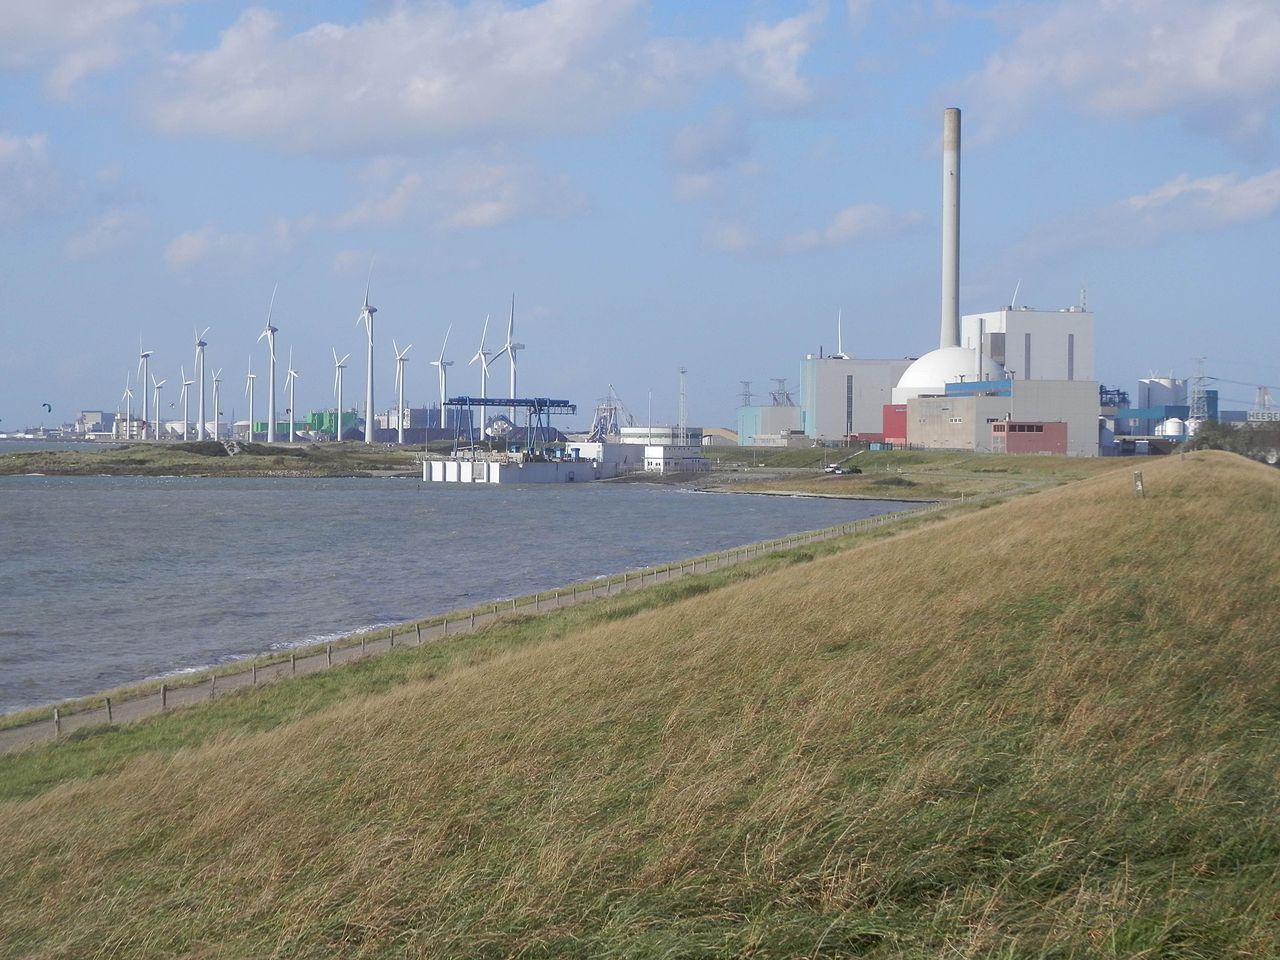 Niederlande reaktiviren die Kernkraft